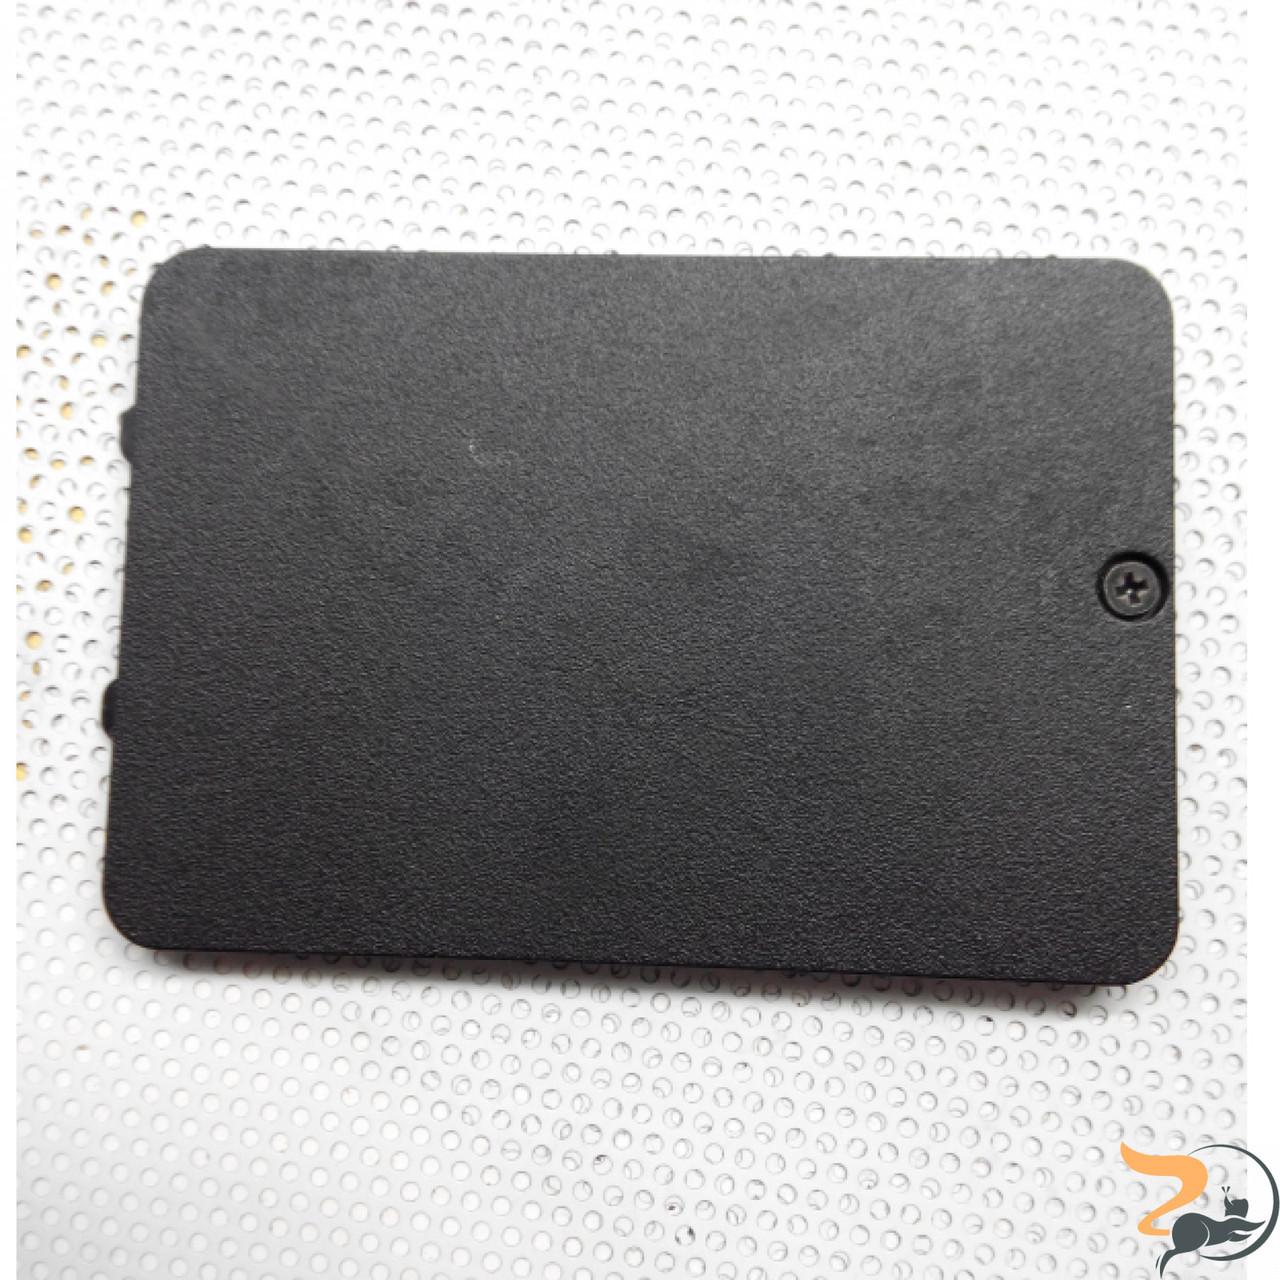 Сервісна кришка для ноутбука Dell Inspiron 1300, MD536 A00, б/у.